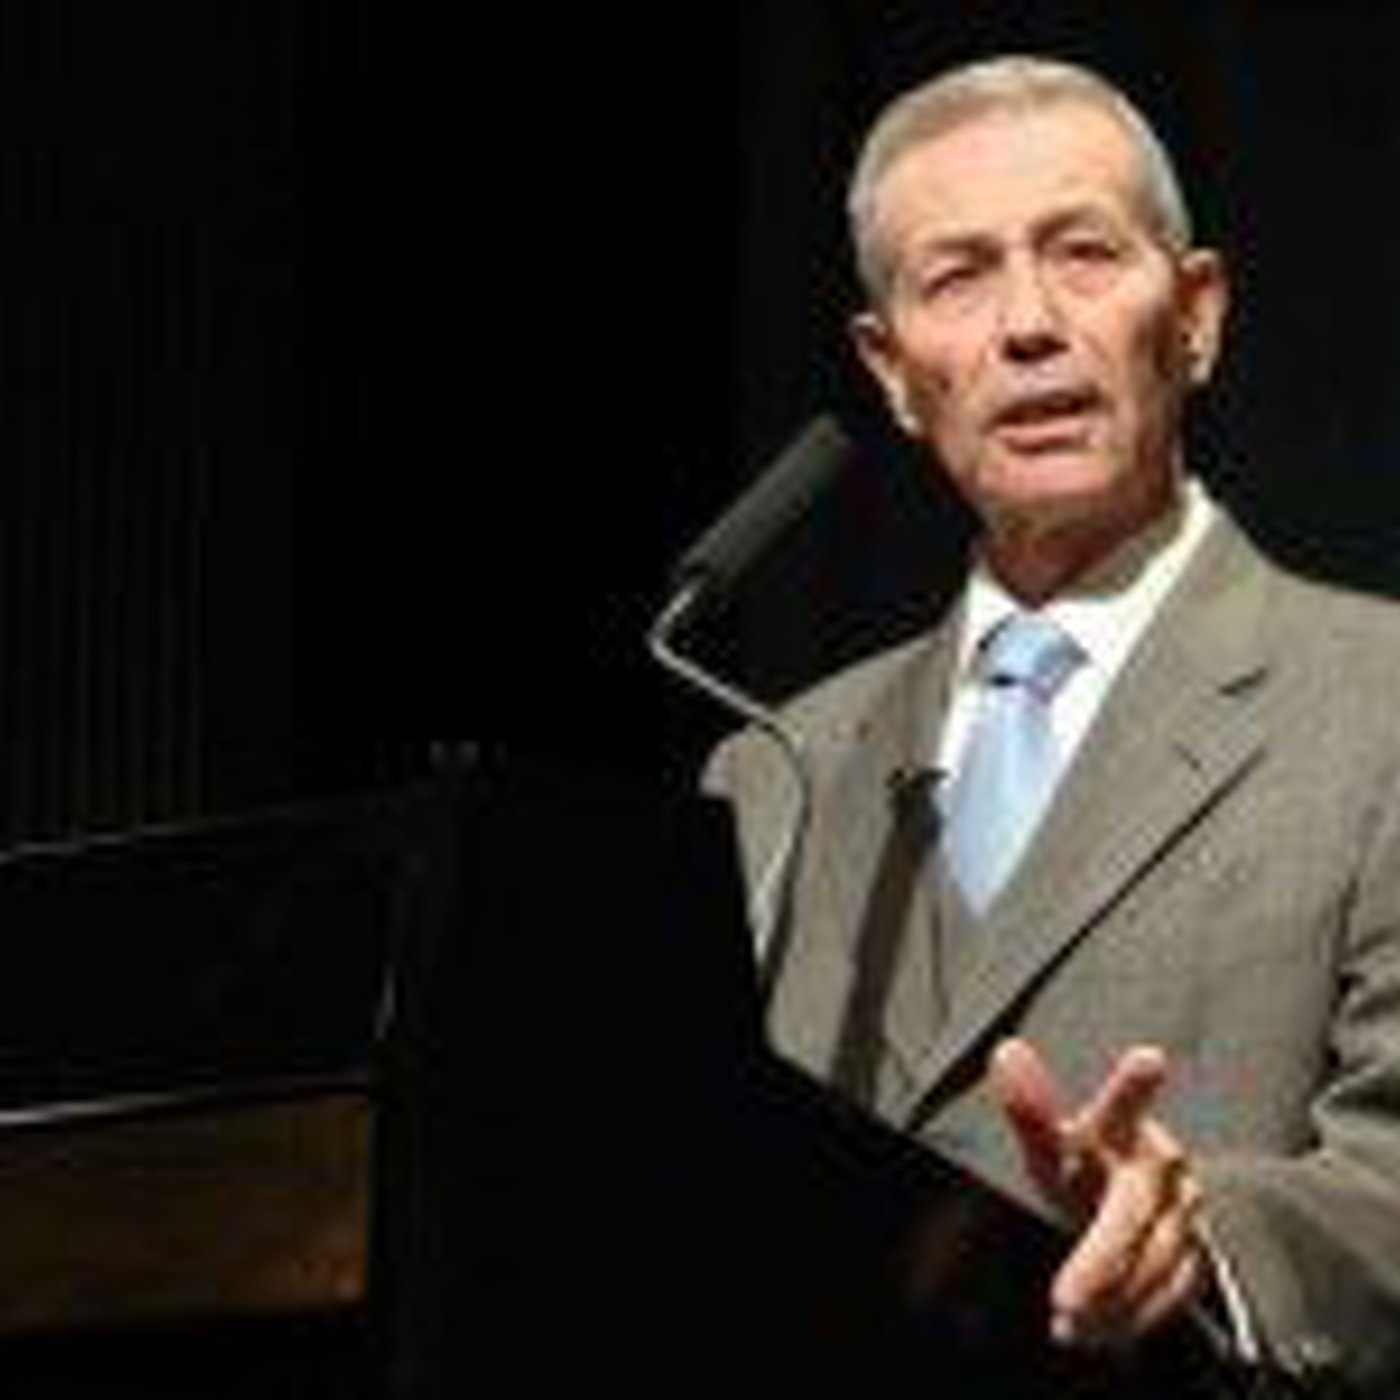 Conferencia - 'Jesús: De la Cruz a la Mortaja' - Antonio Piñero